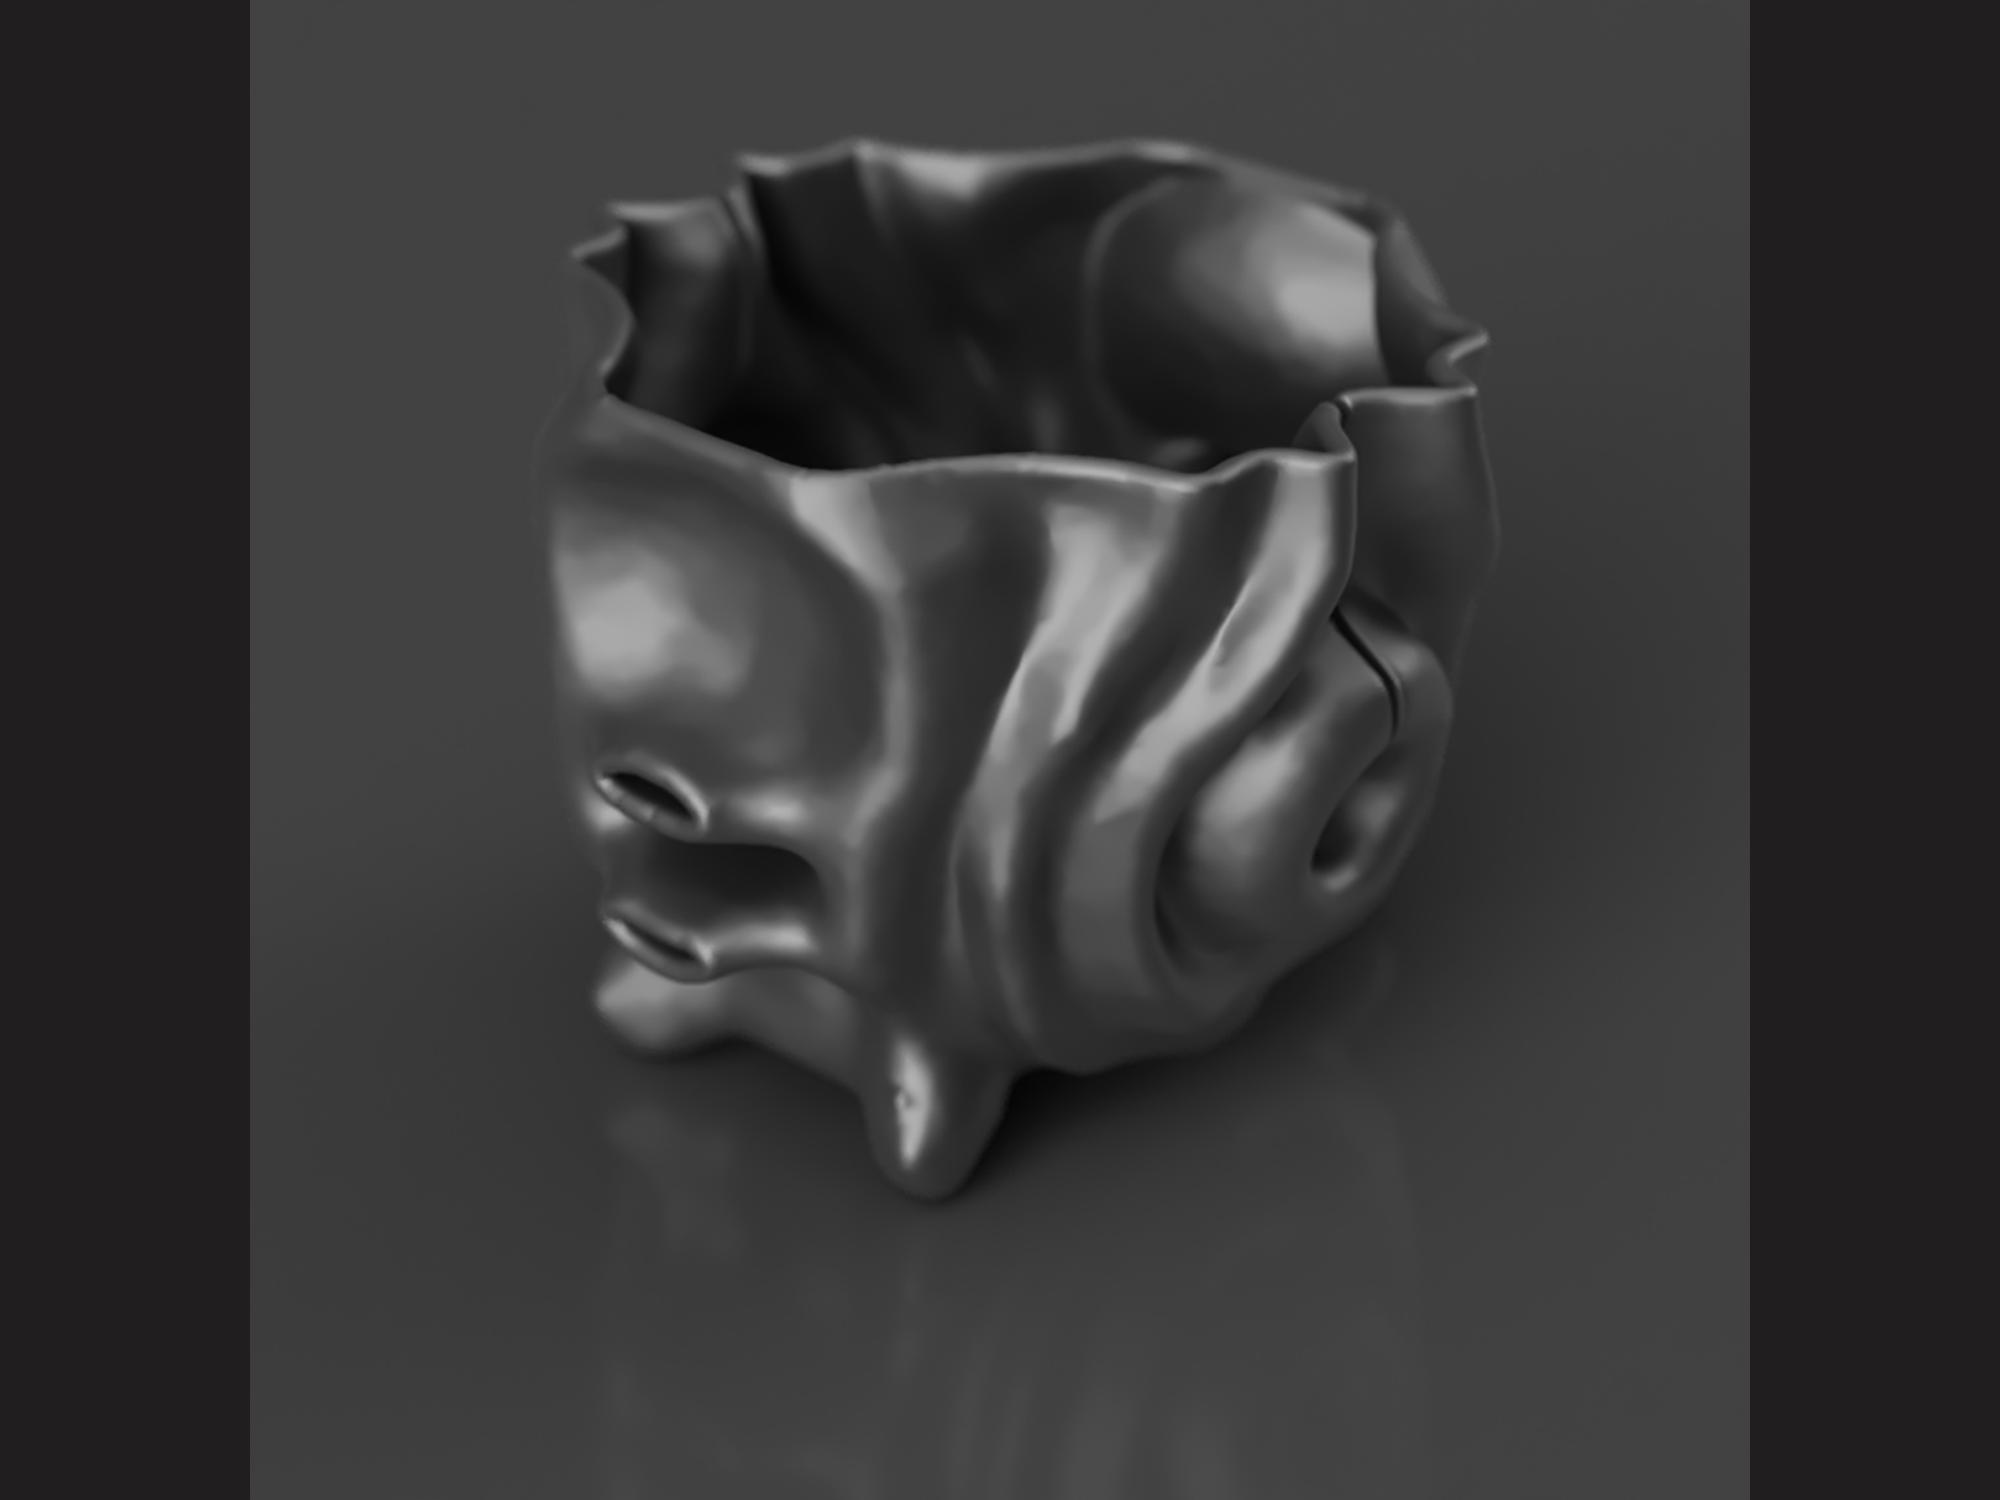 model rendered in Blender3d